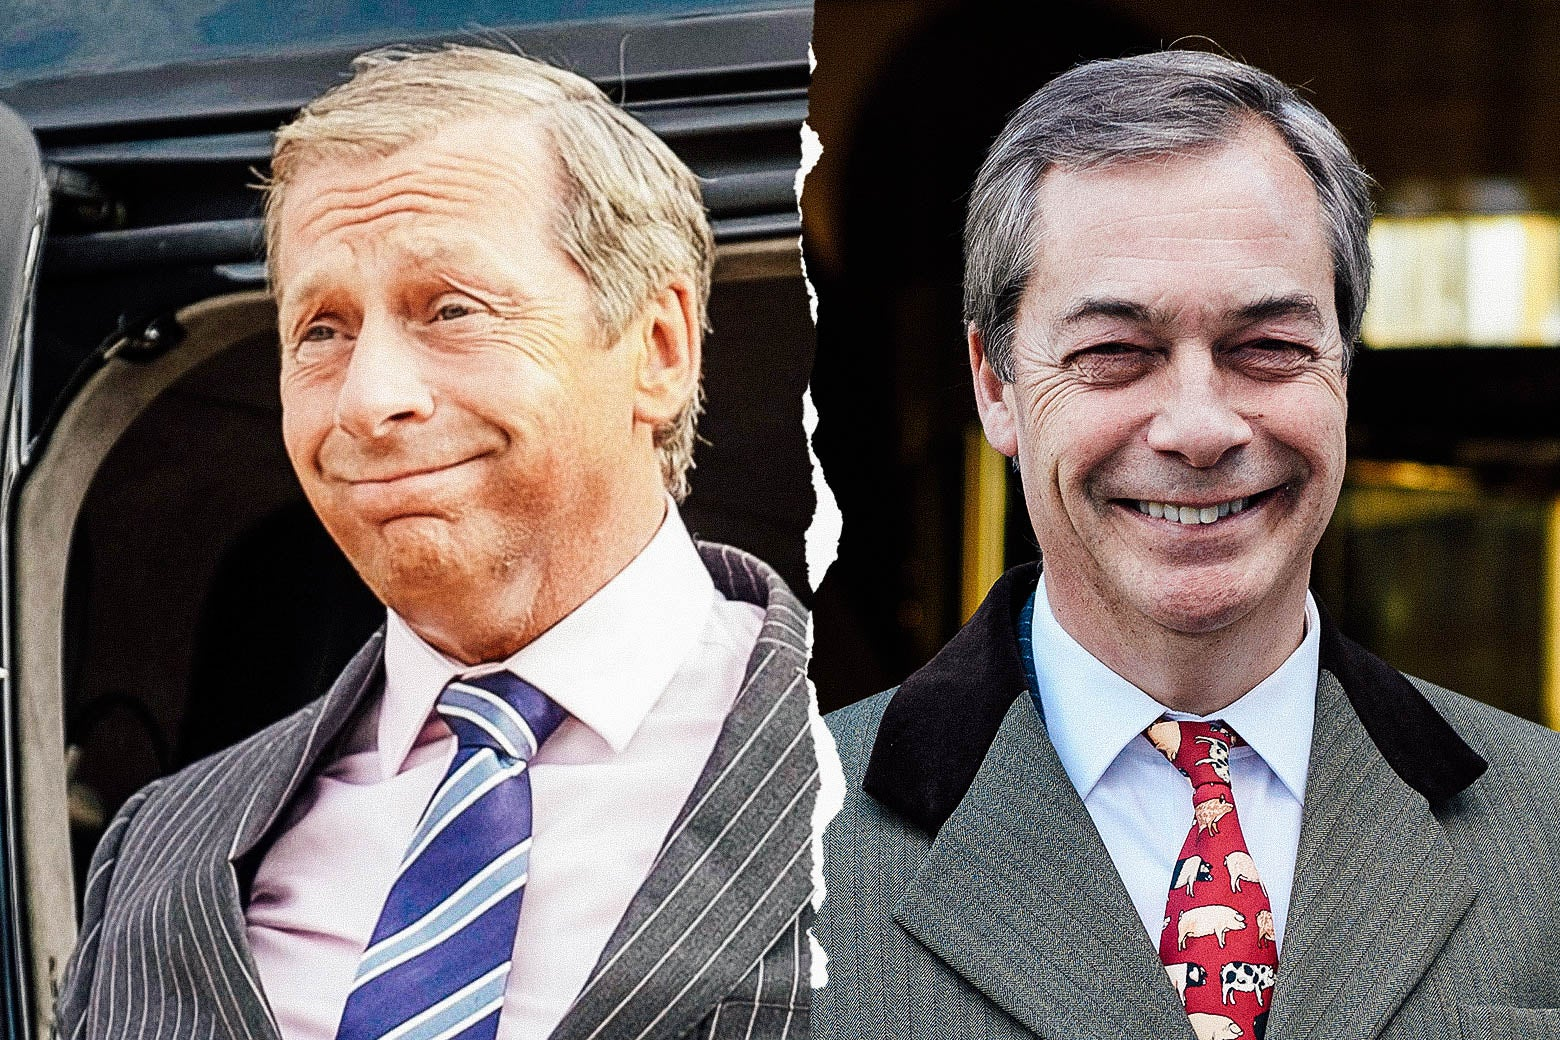 Paul Ryan as Nigel Farage, and the real Nigel Farage.